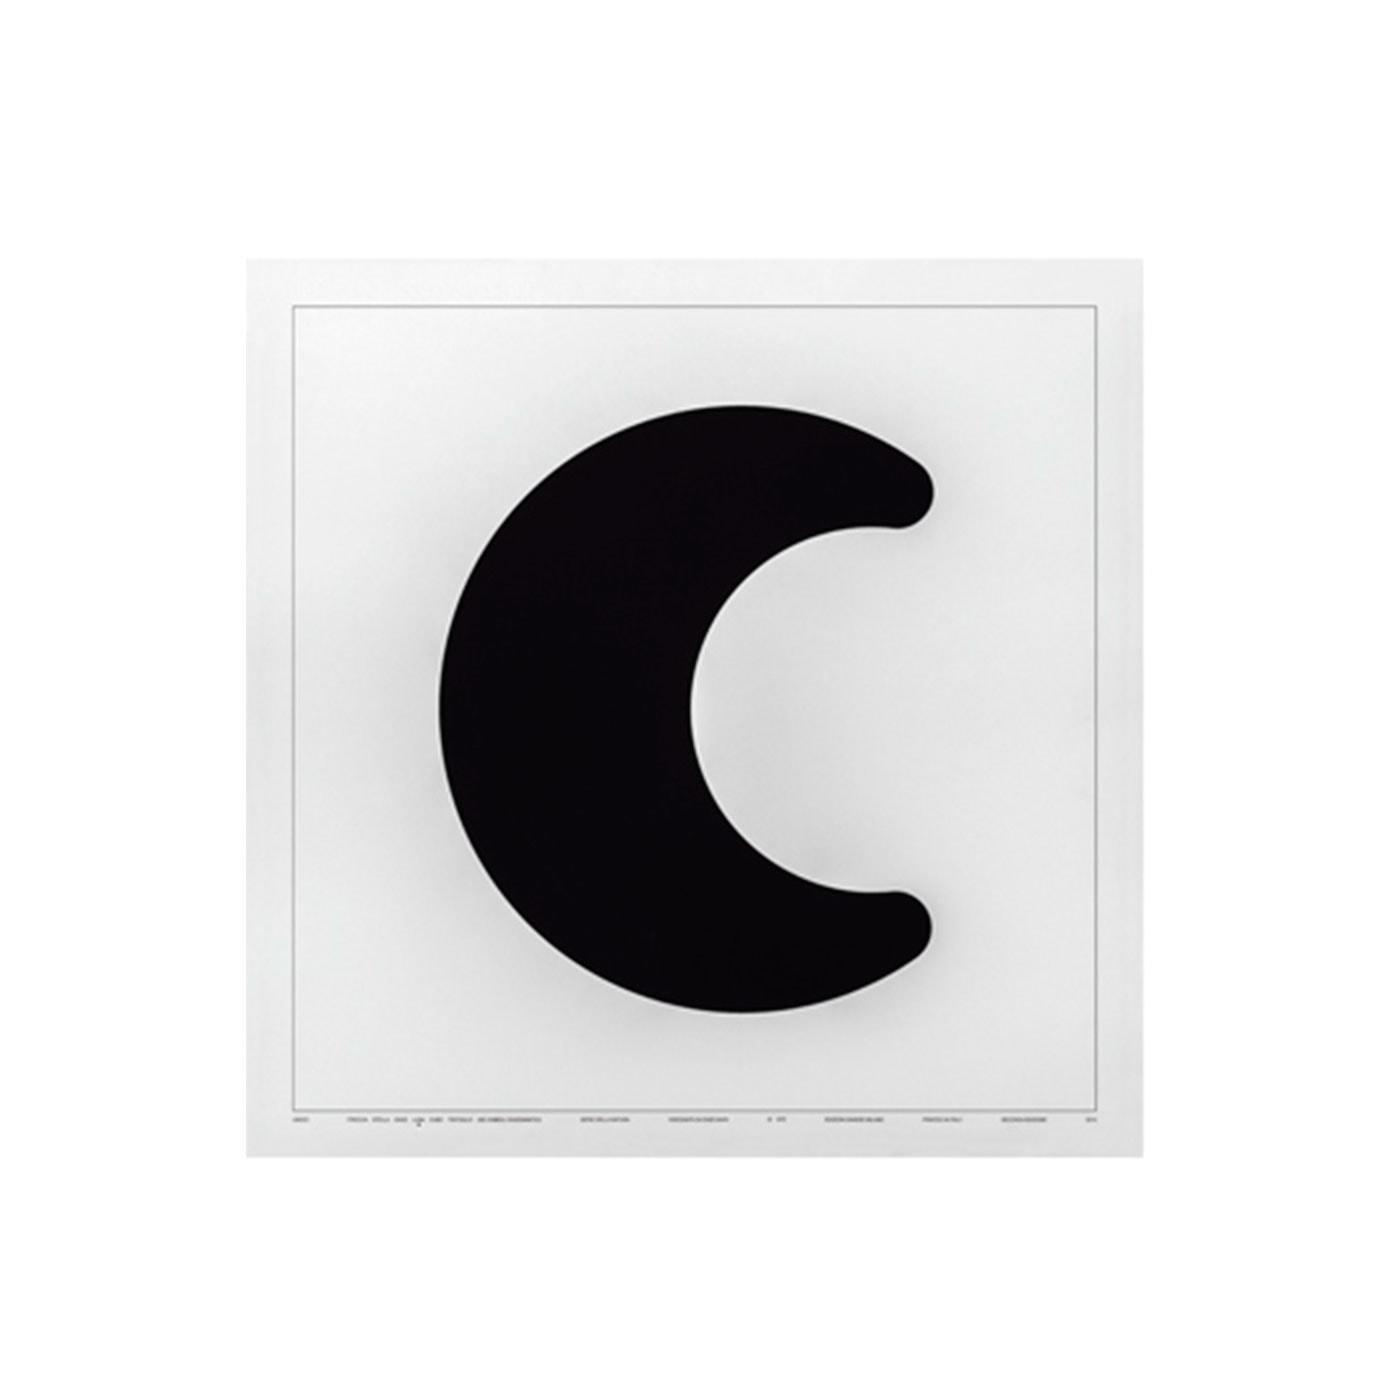 Undici, Luna serigrafia